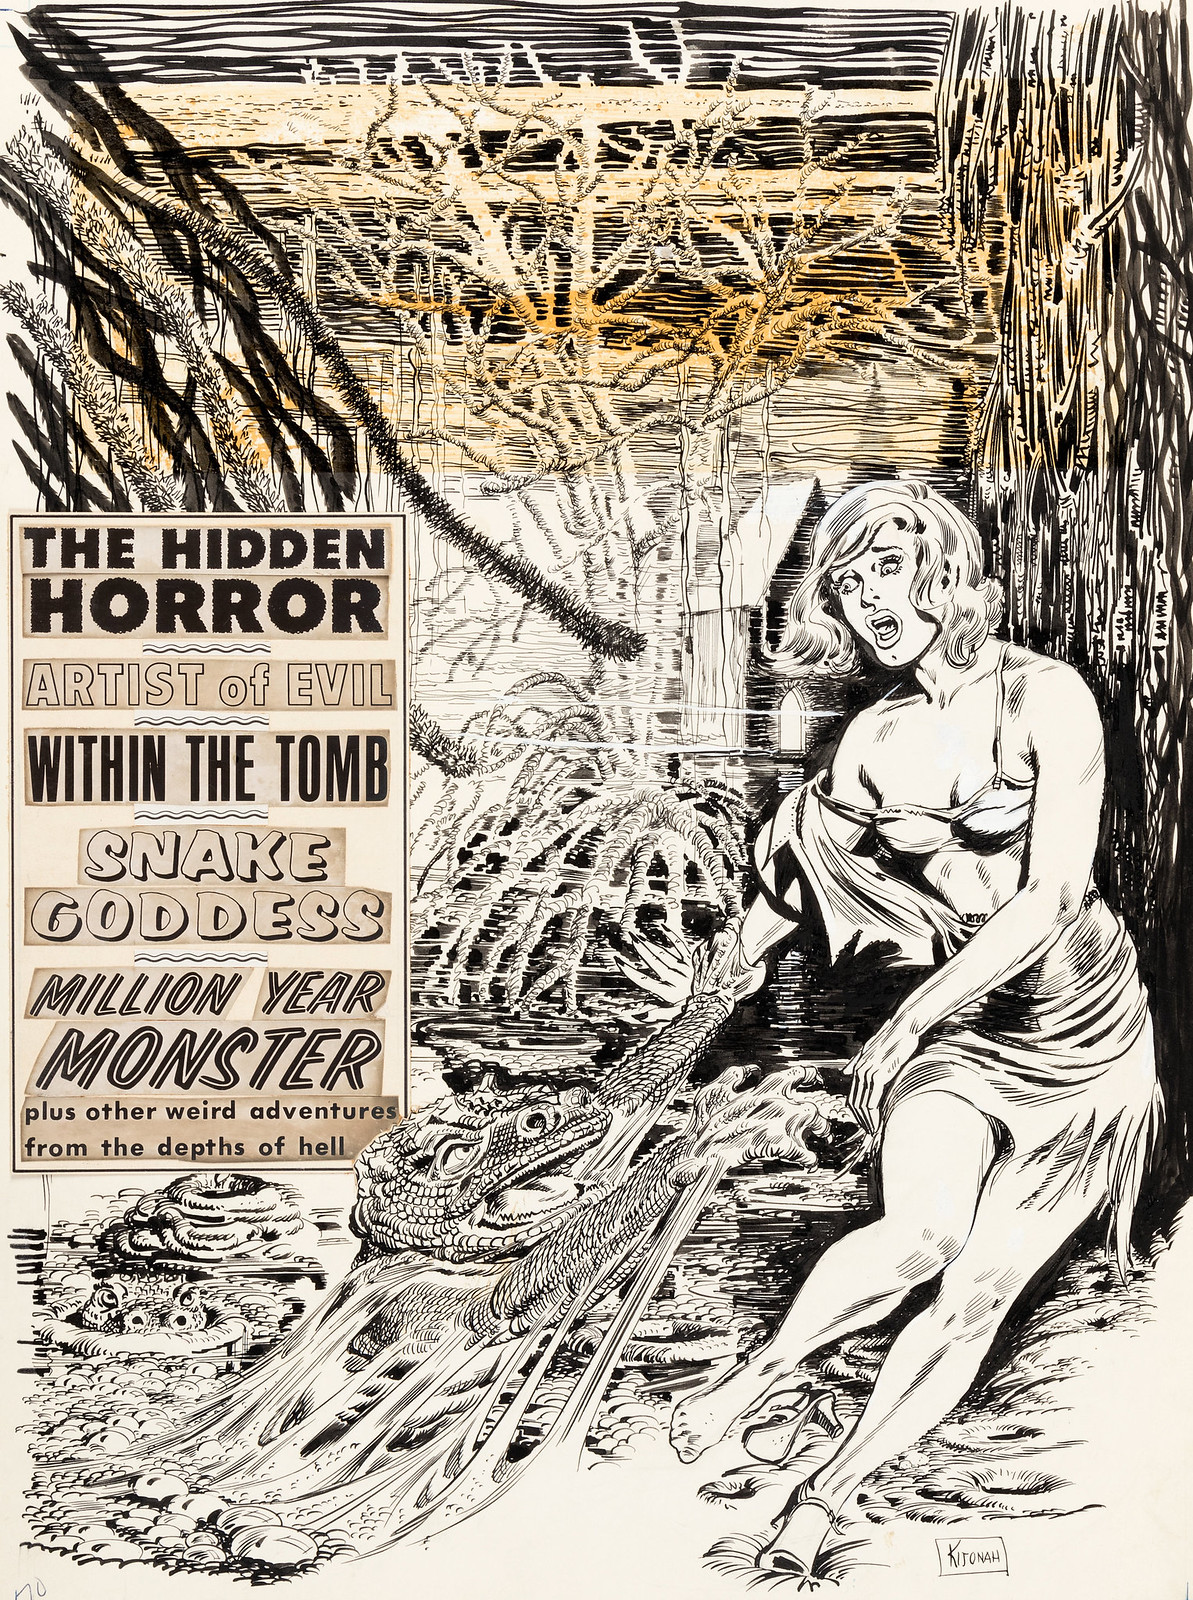 Shock, Original ink illustration by Kijonah - Volume 1, Issue 03, September 1969